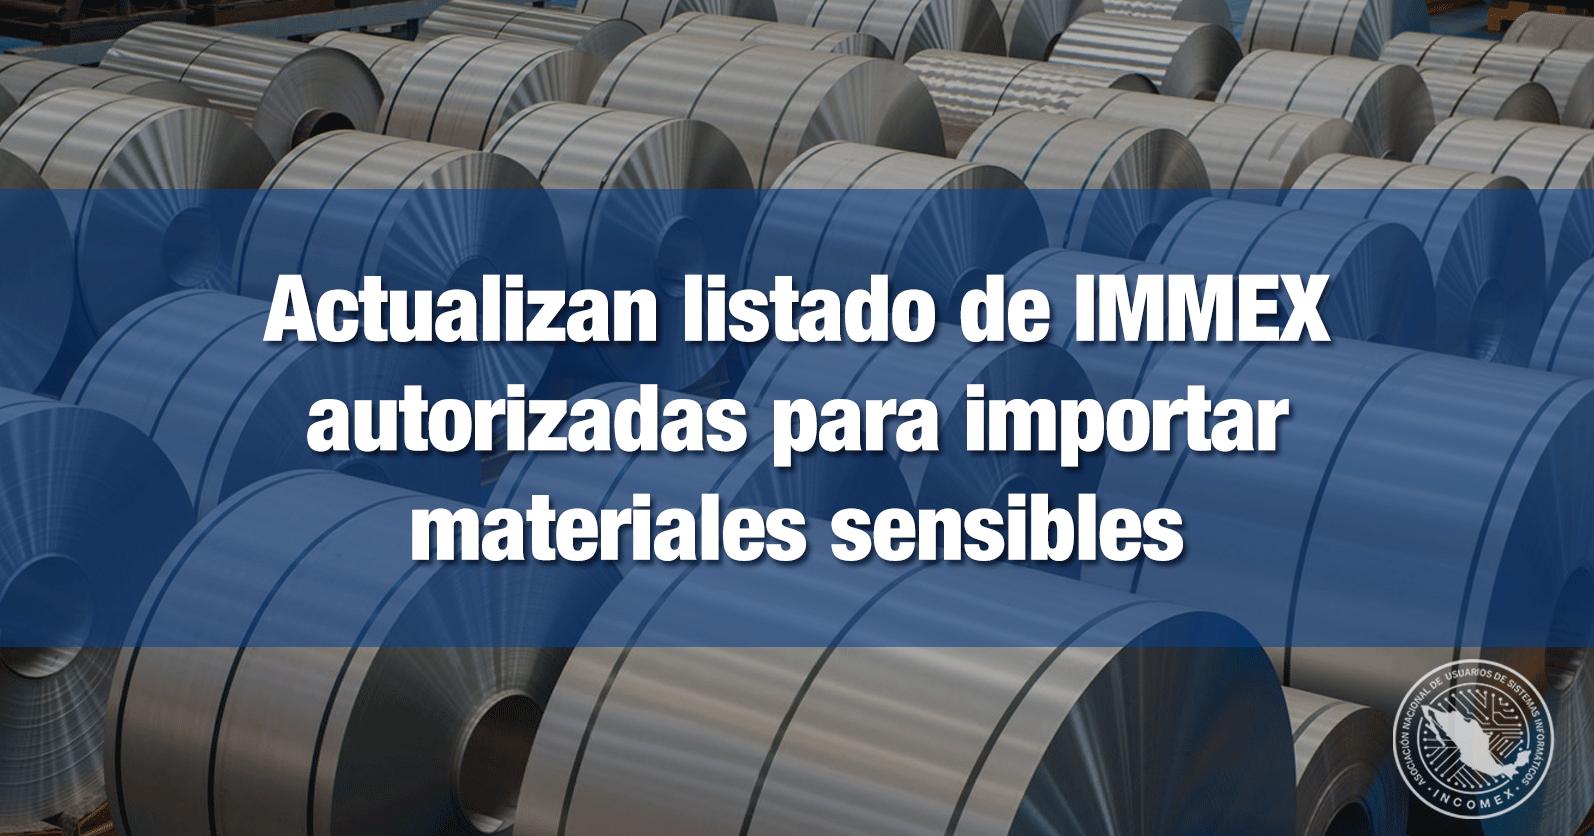 Actualizan listado de IMMEX autorizadas para importar materiales sensibles